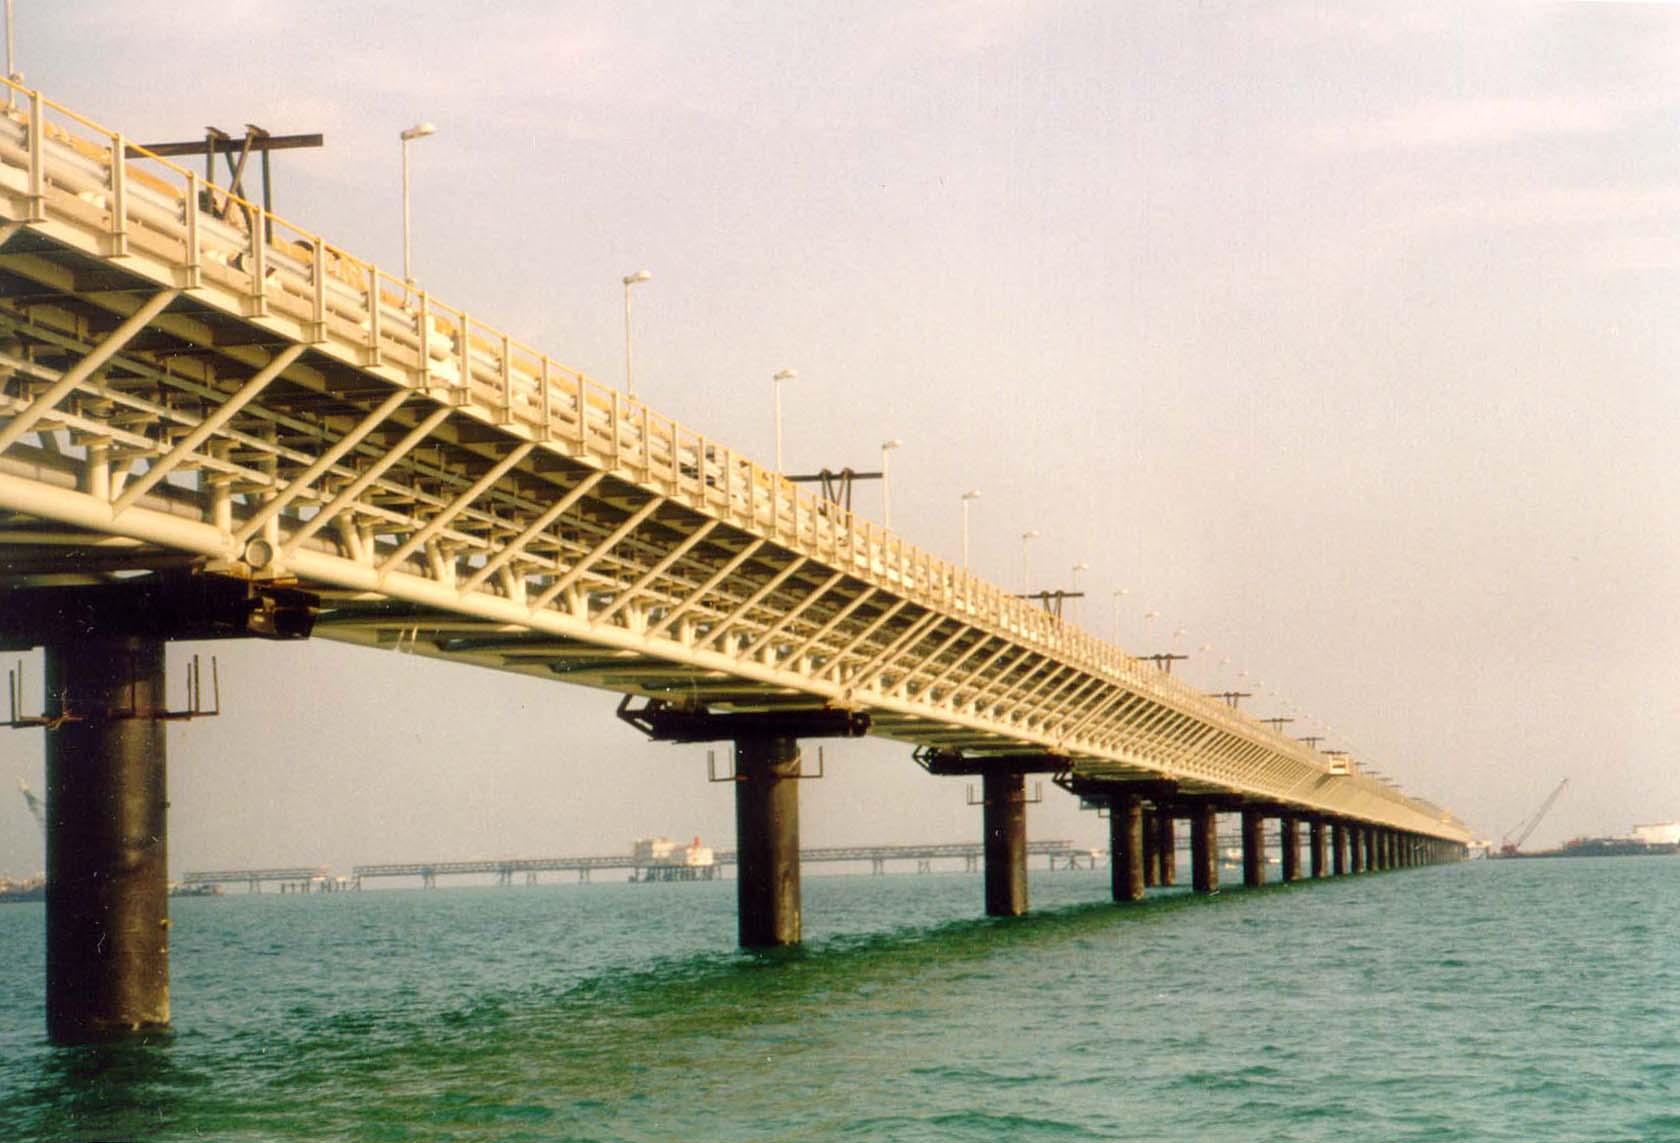 Jamnagar Complex marine